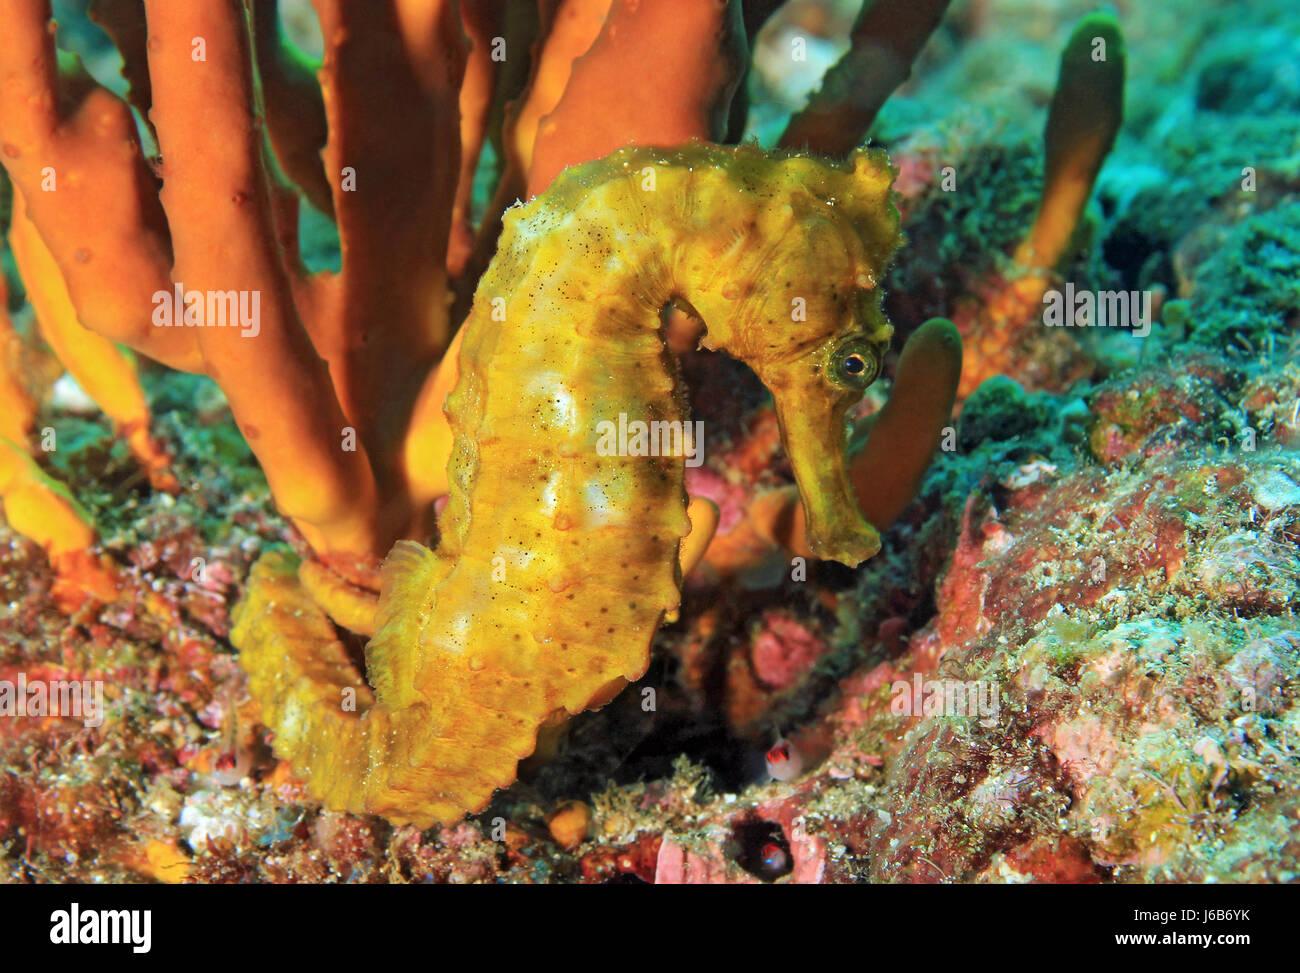 Yellow Pacific Seahorse (Hippocampus ingens). Coiba, Panama - Stock Image